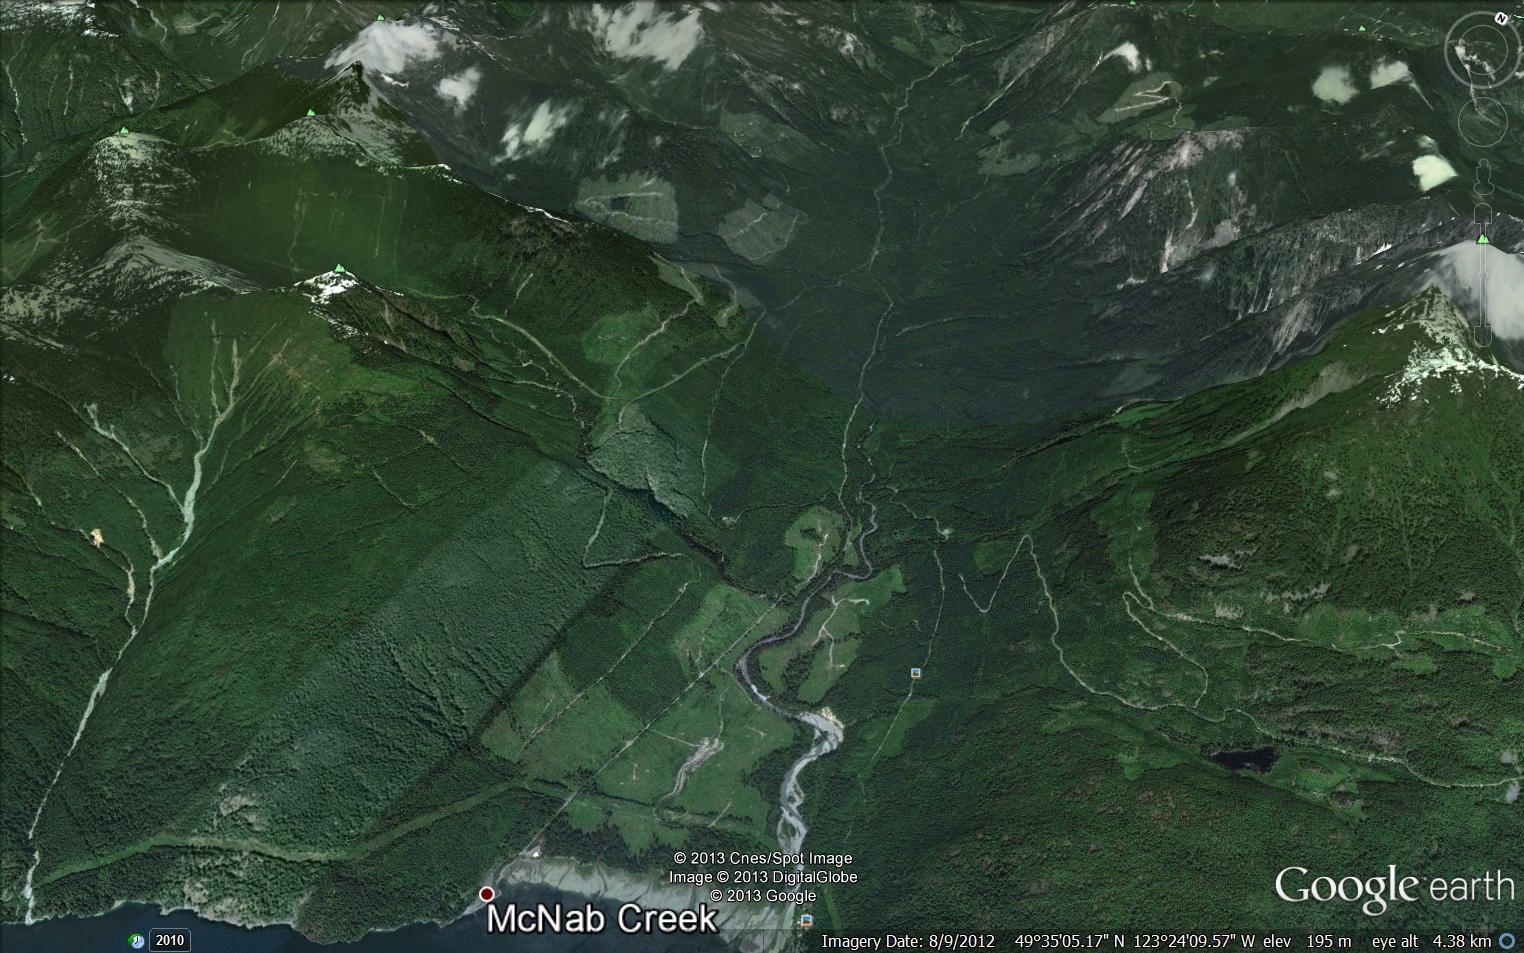 Google Earth - Maps - Dakota Bowl Watershed - Elphinstone